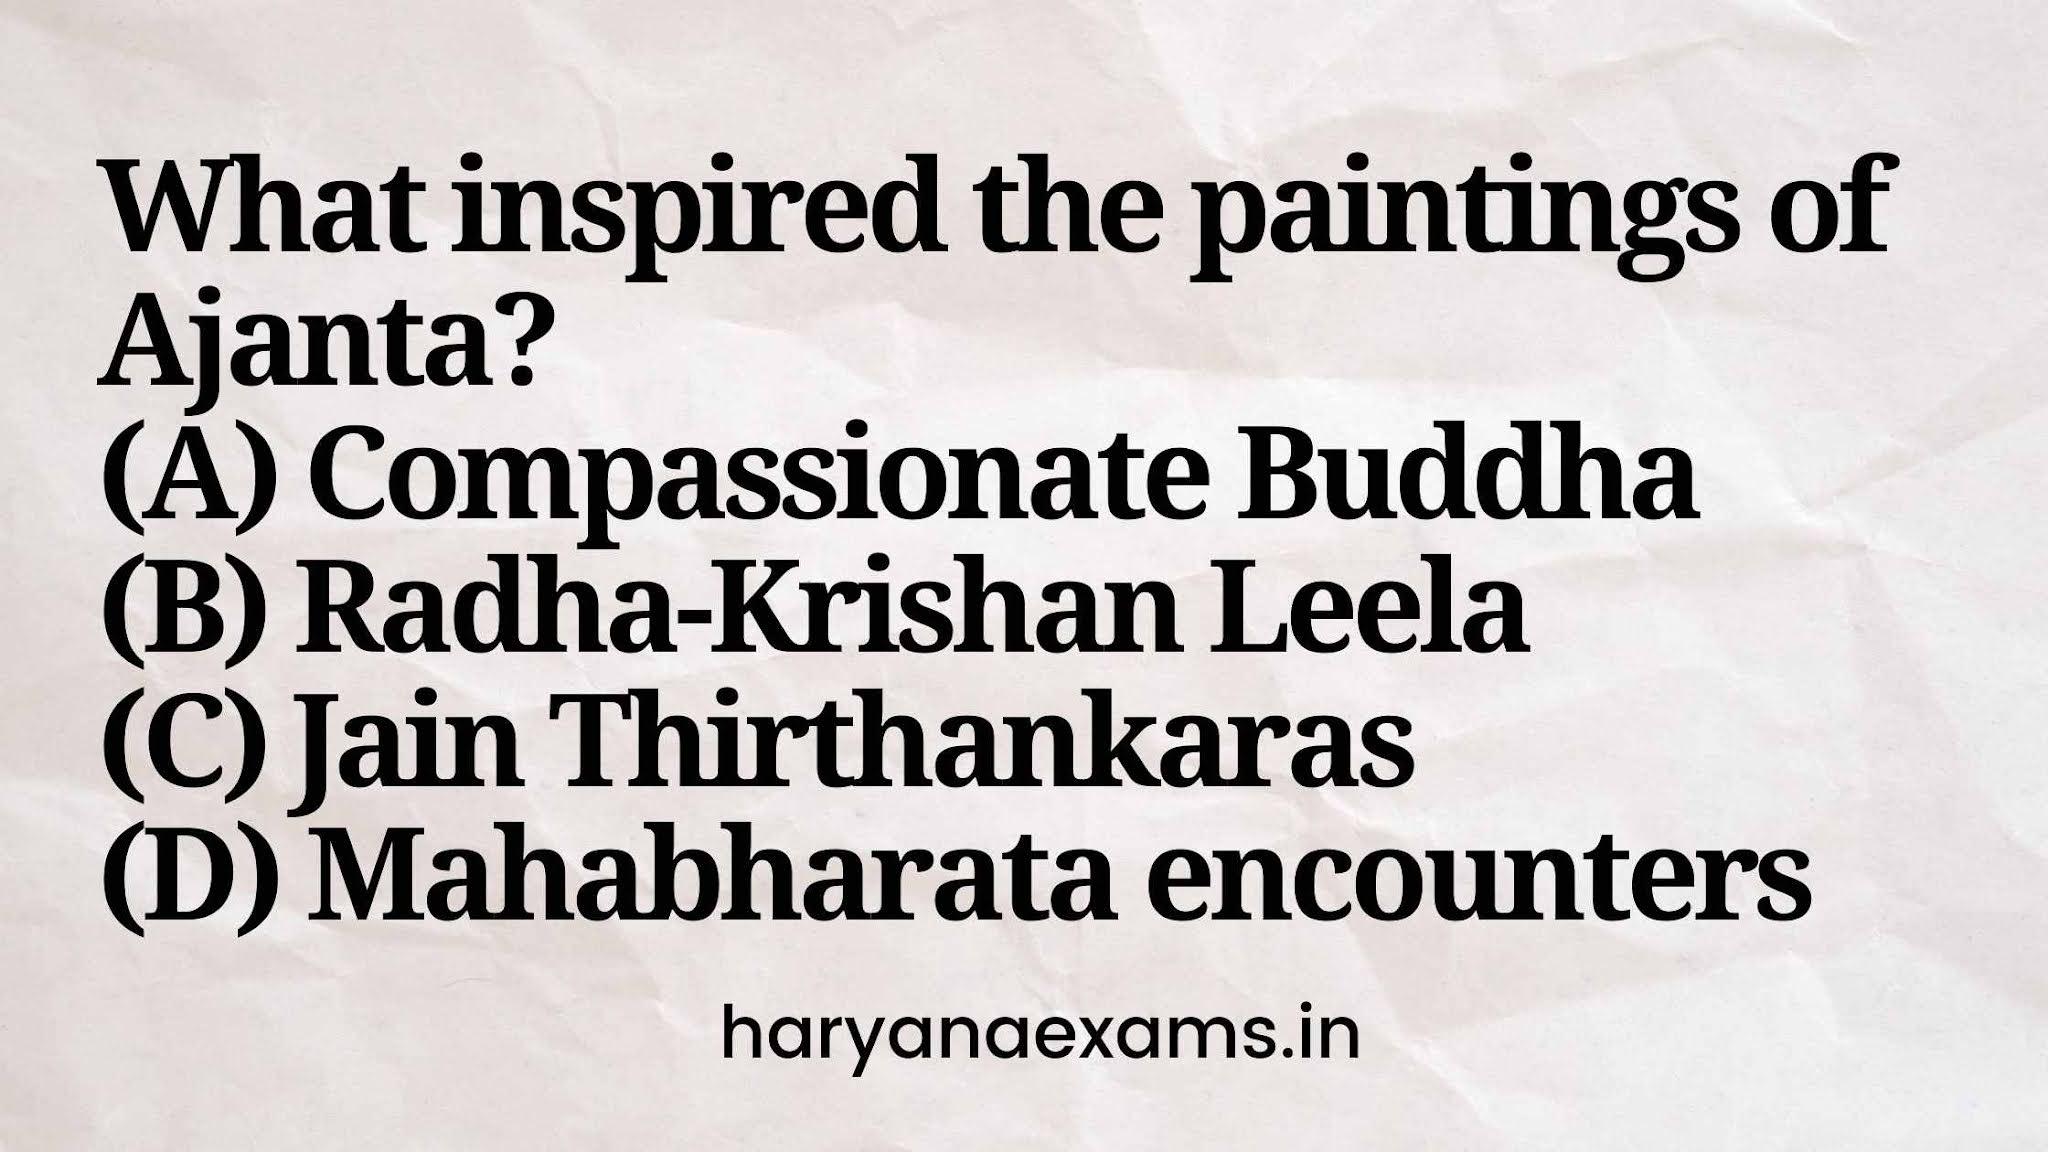 What inspired the paintings of Ajanta?  (A) Compassionate Buddha  (B) Radha-Krishan Leela  (C) Jain Thirthankaras  (D) Mahabharata encounters